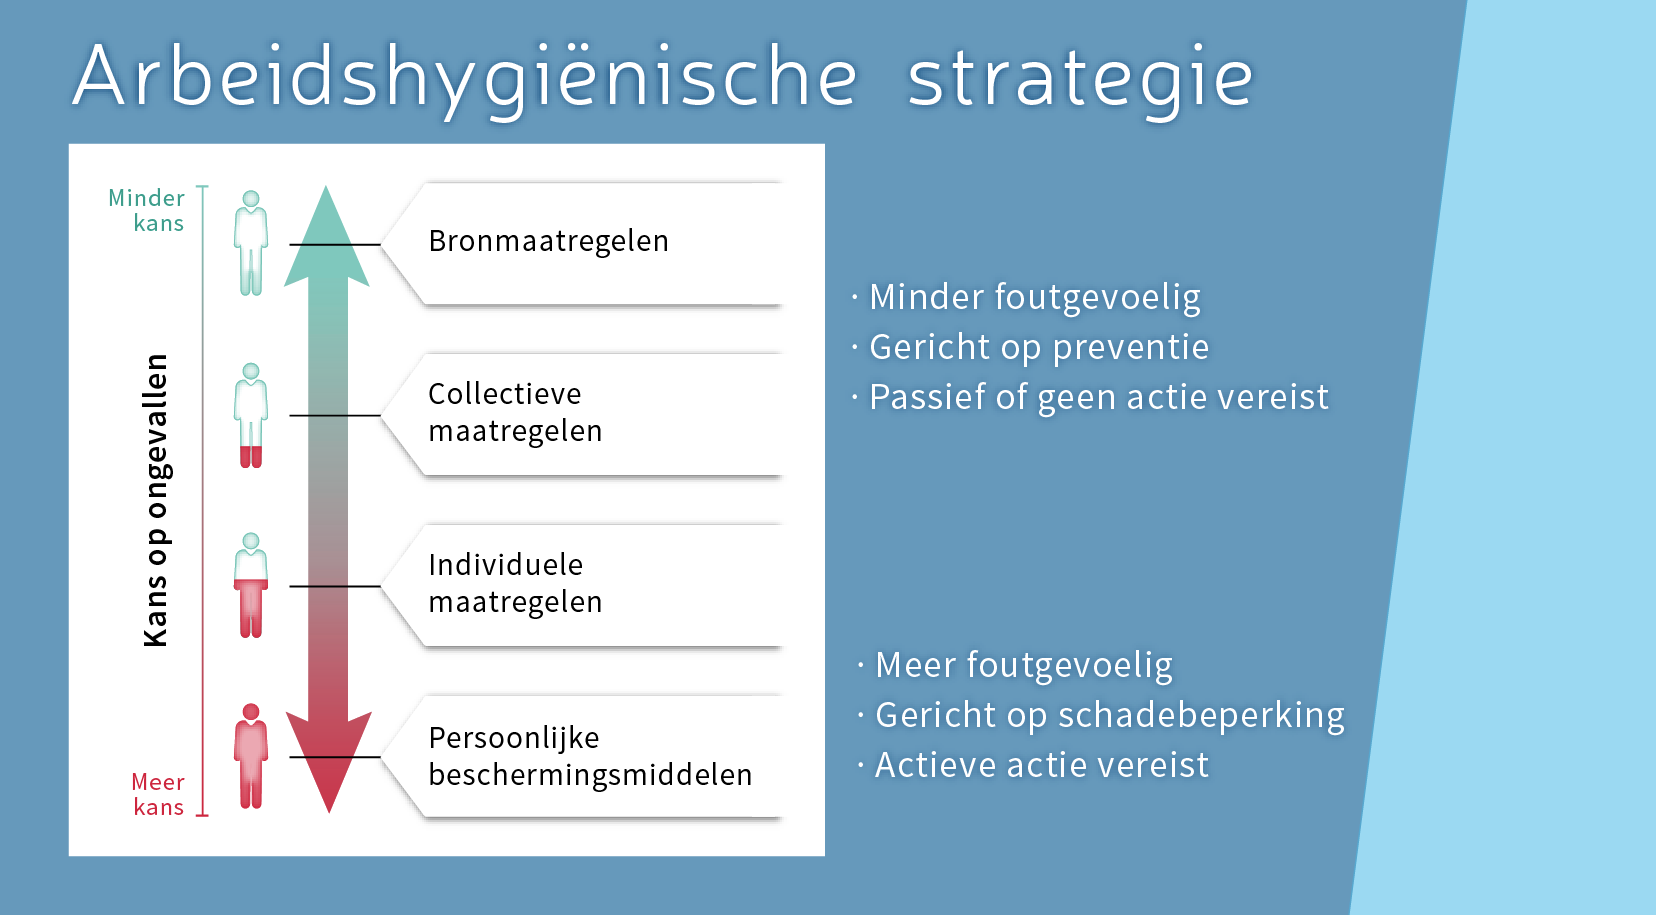 Arbeidshygienische-strategie-kans-op-ongevallen-Vlindar